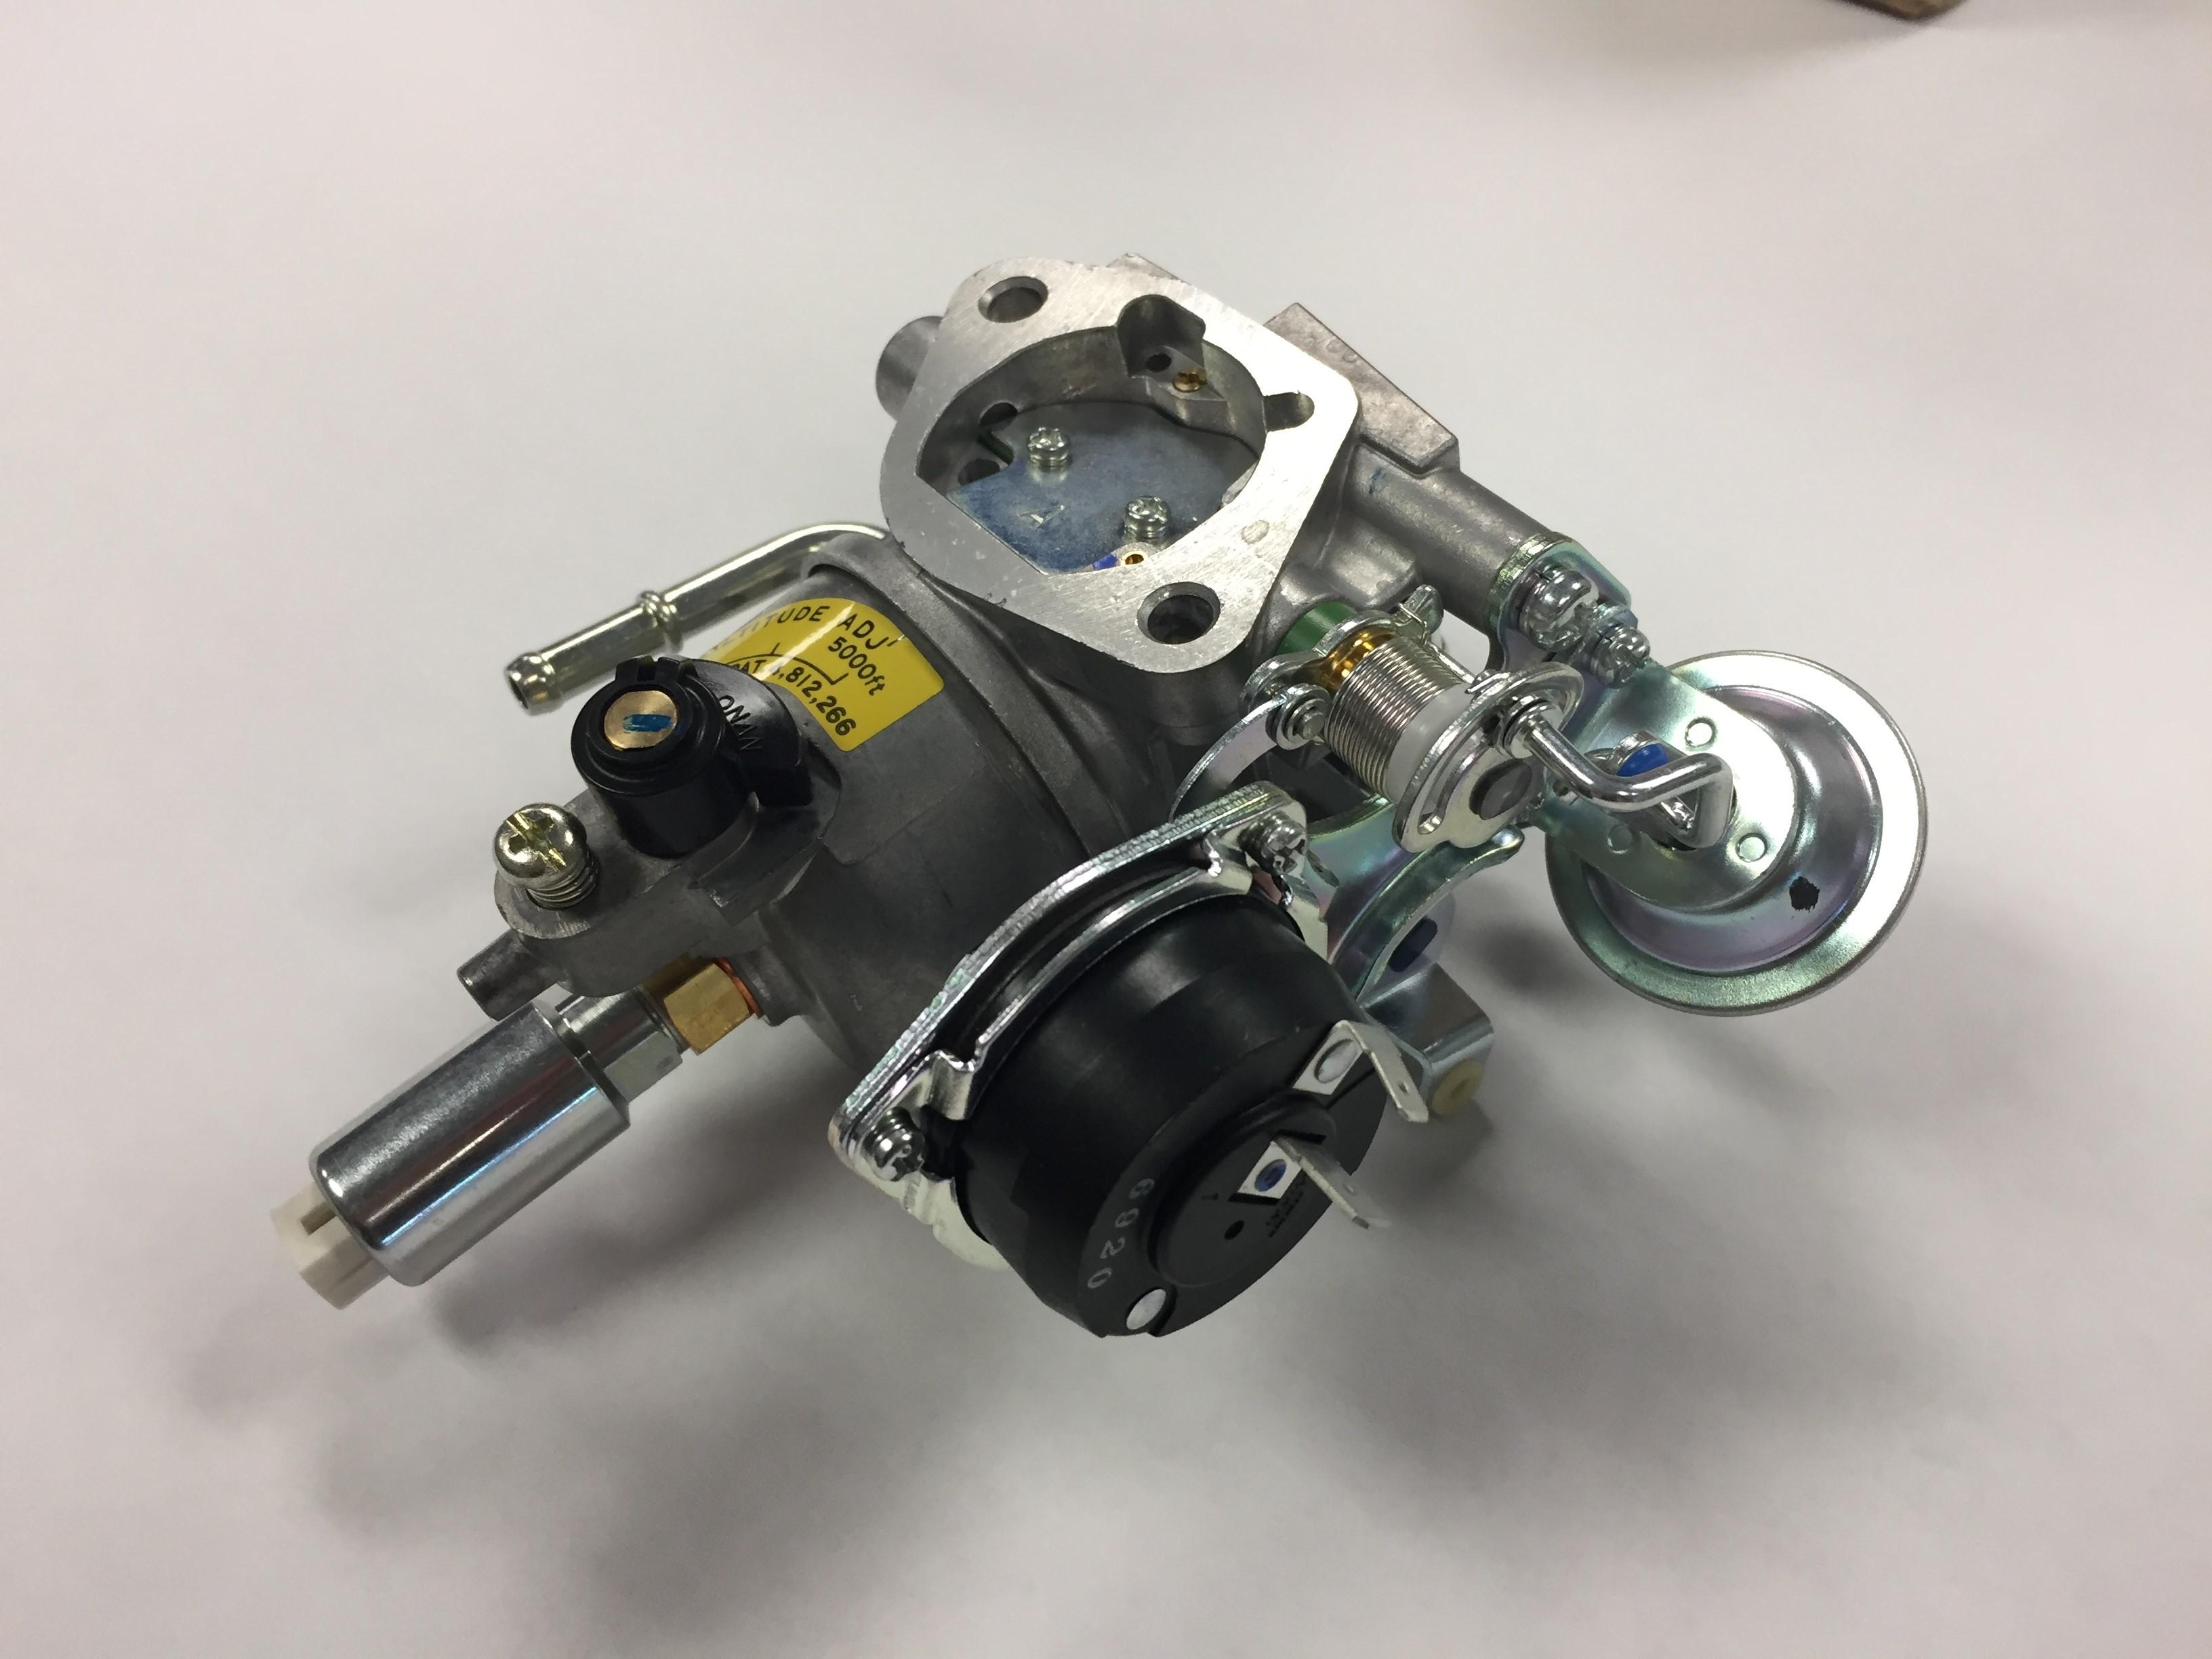 replacement parts for installed generators ppl motor homes rh pplmotorhomes com onan generator remote switch wiring diagram onan generator 4000 schematic [ 3264 x 2448 Pixel ]